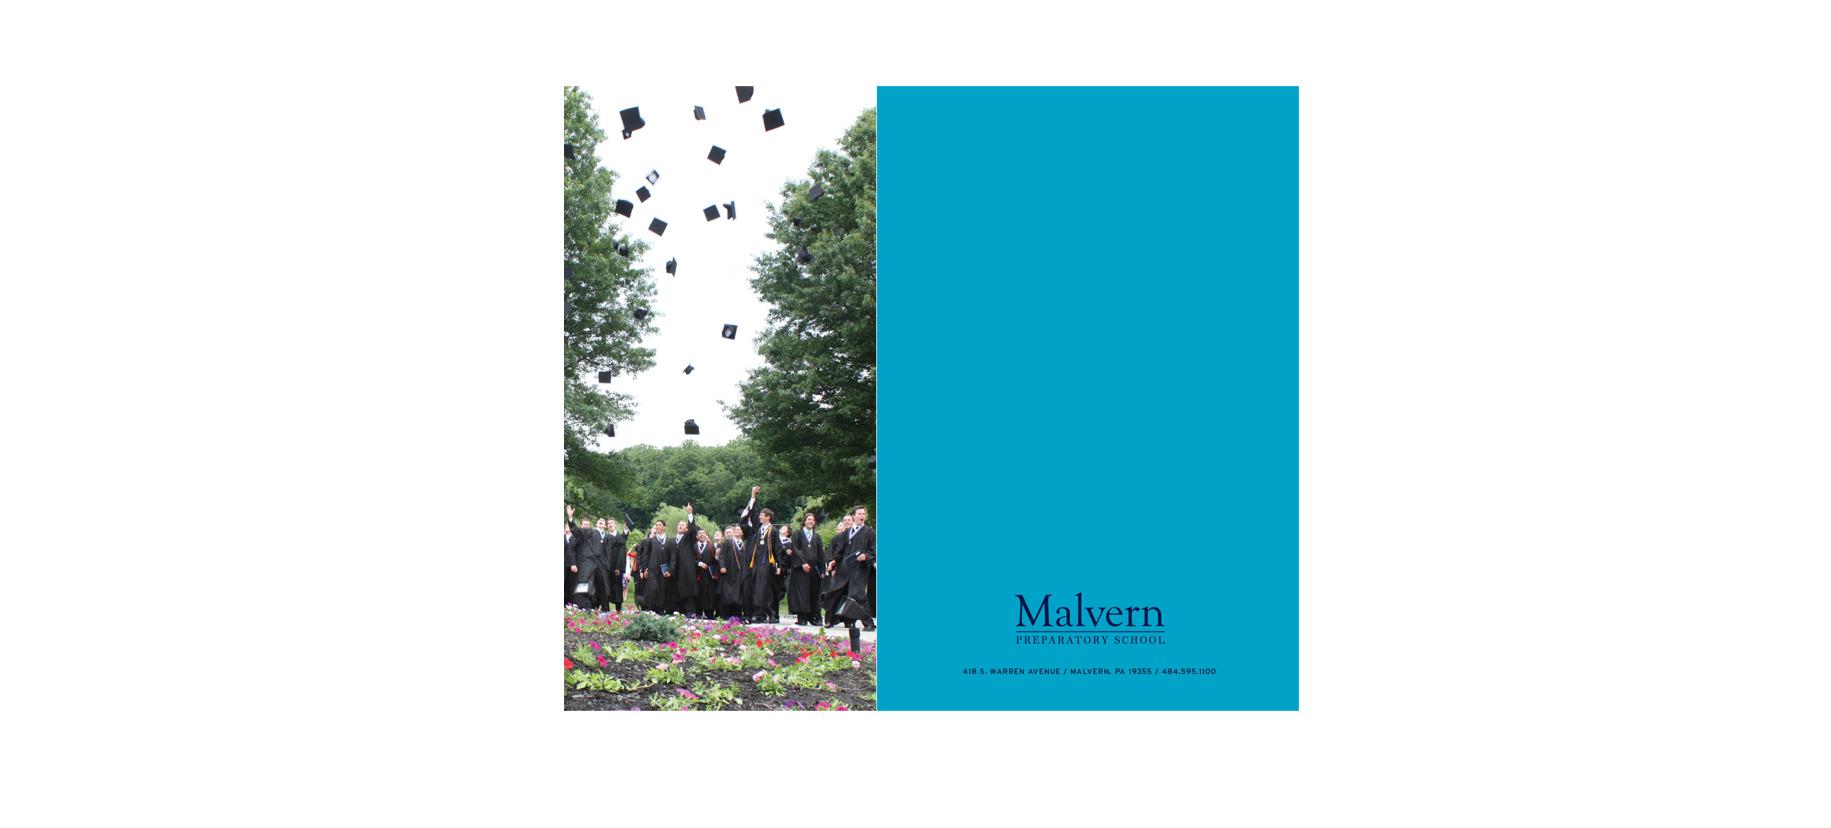 kelsh-wilson-design-malvern-prep-capital-campaign-case-statement-back-cover.jpg